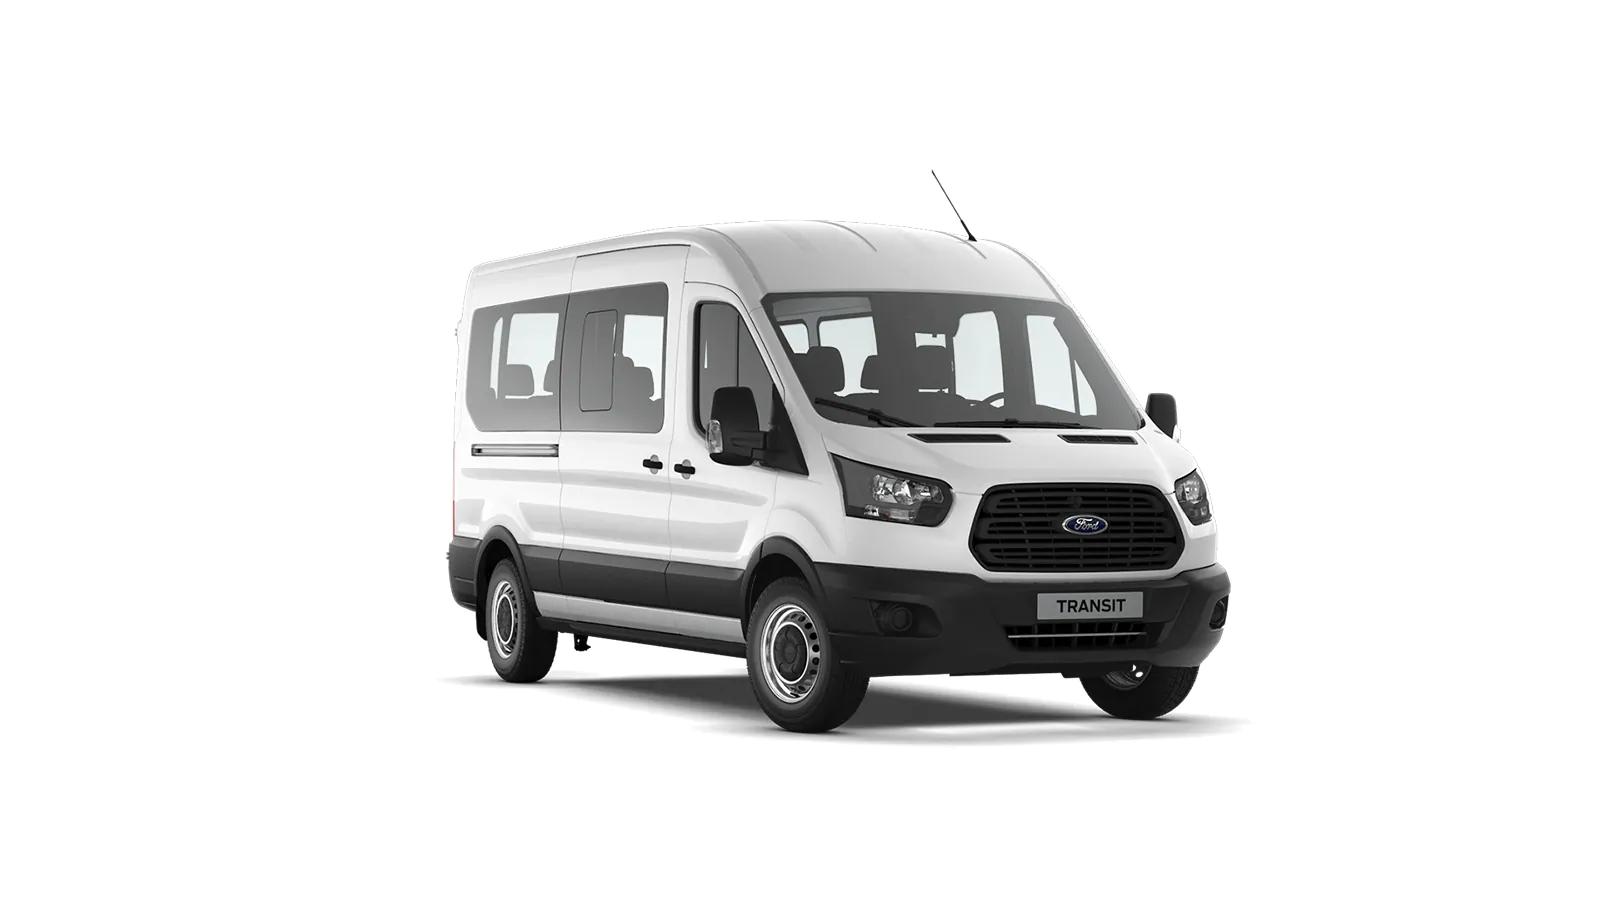 Ford Transit Trend Minibus MHEV